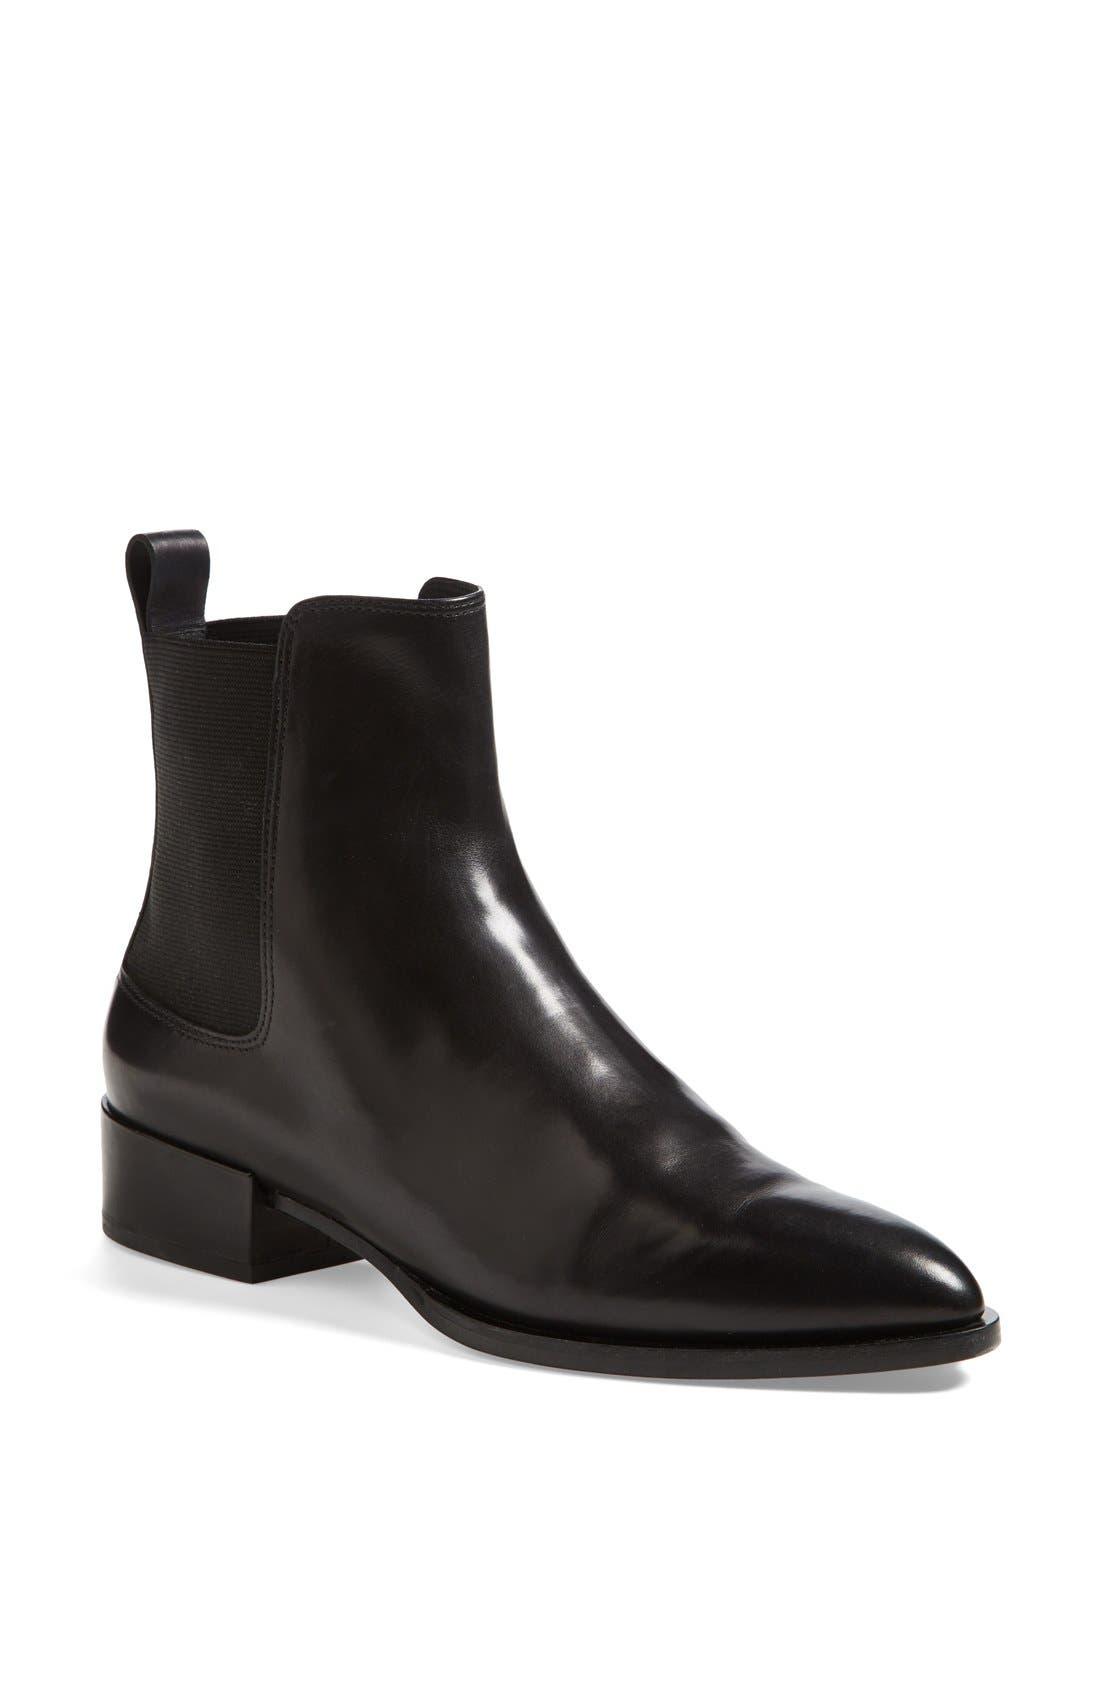 'Yarmon' Almond Toe Calfskin Leather Chelsea Boot,                         Main,                         color, 002